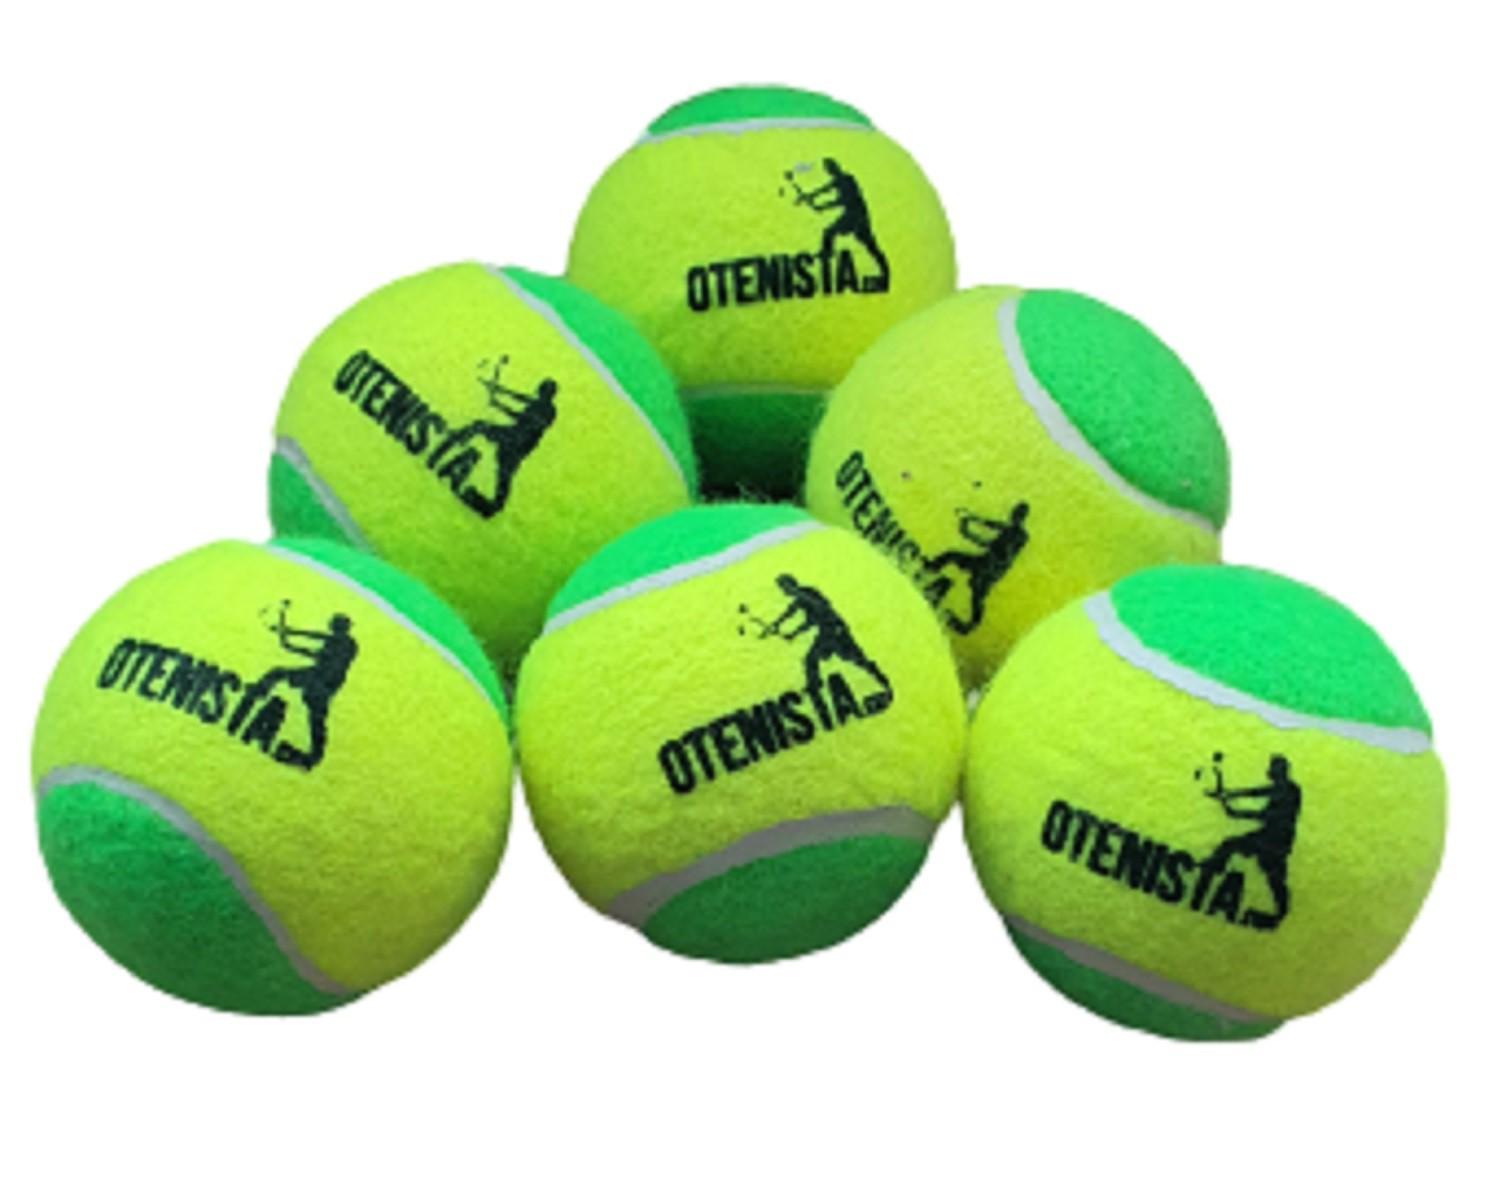 Bolas de Tenis Estagio 1 Infantil O Tenista 6 Unidades